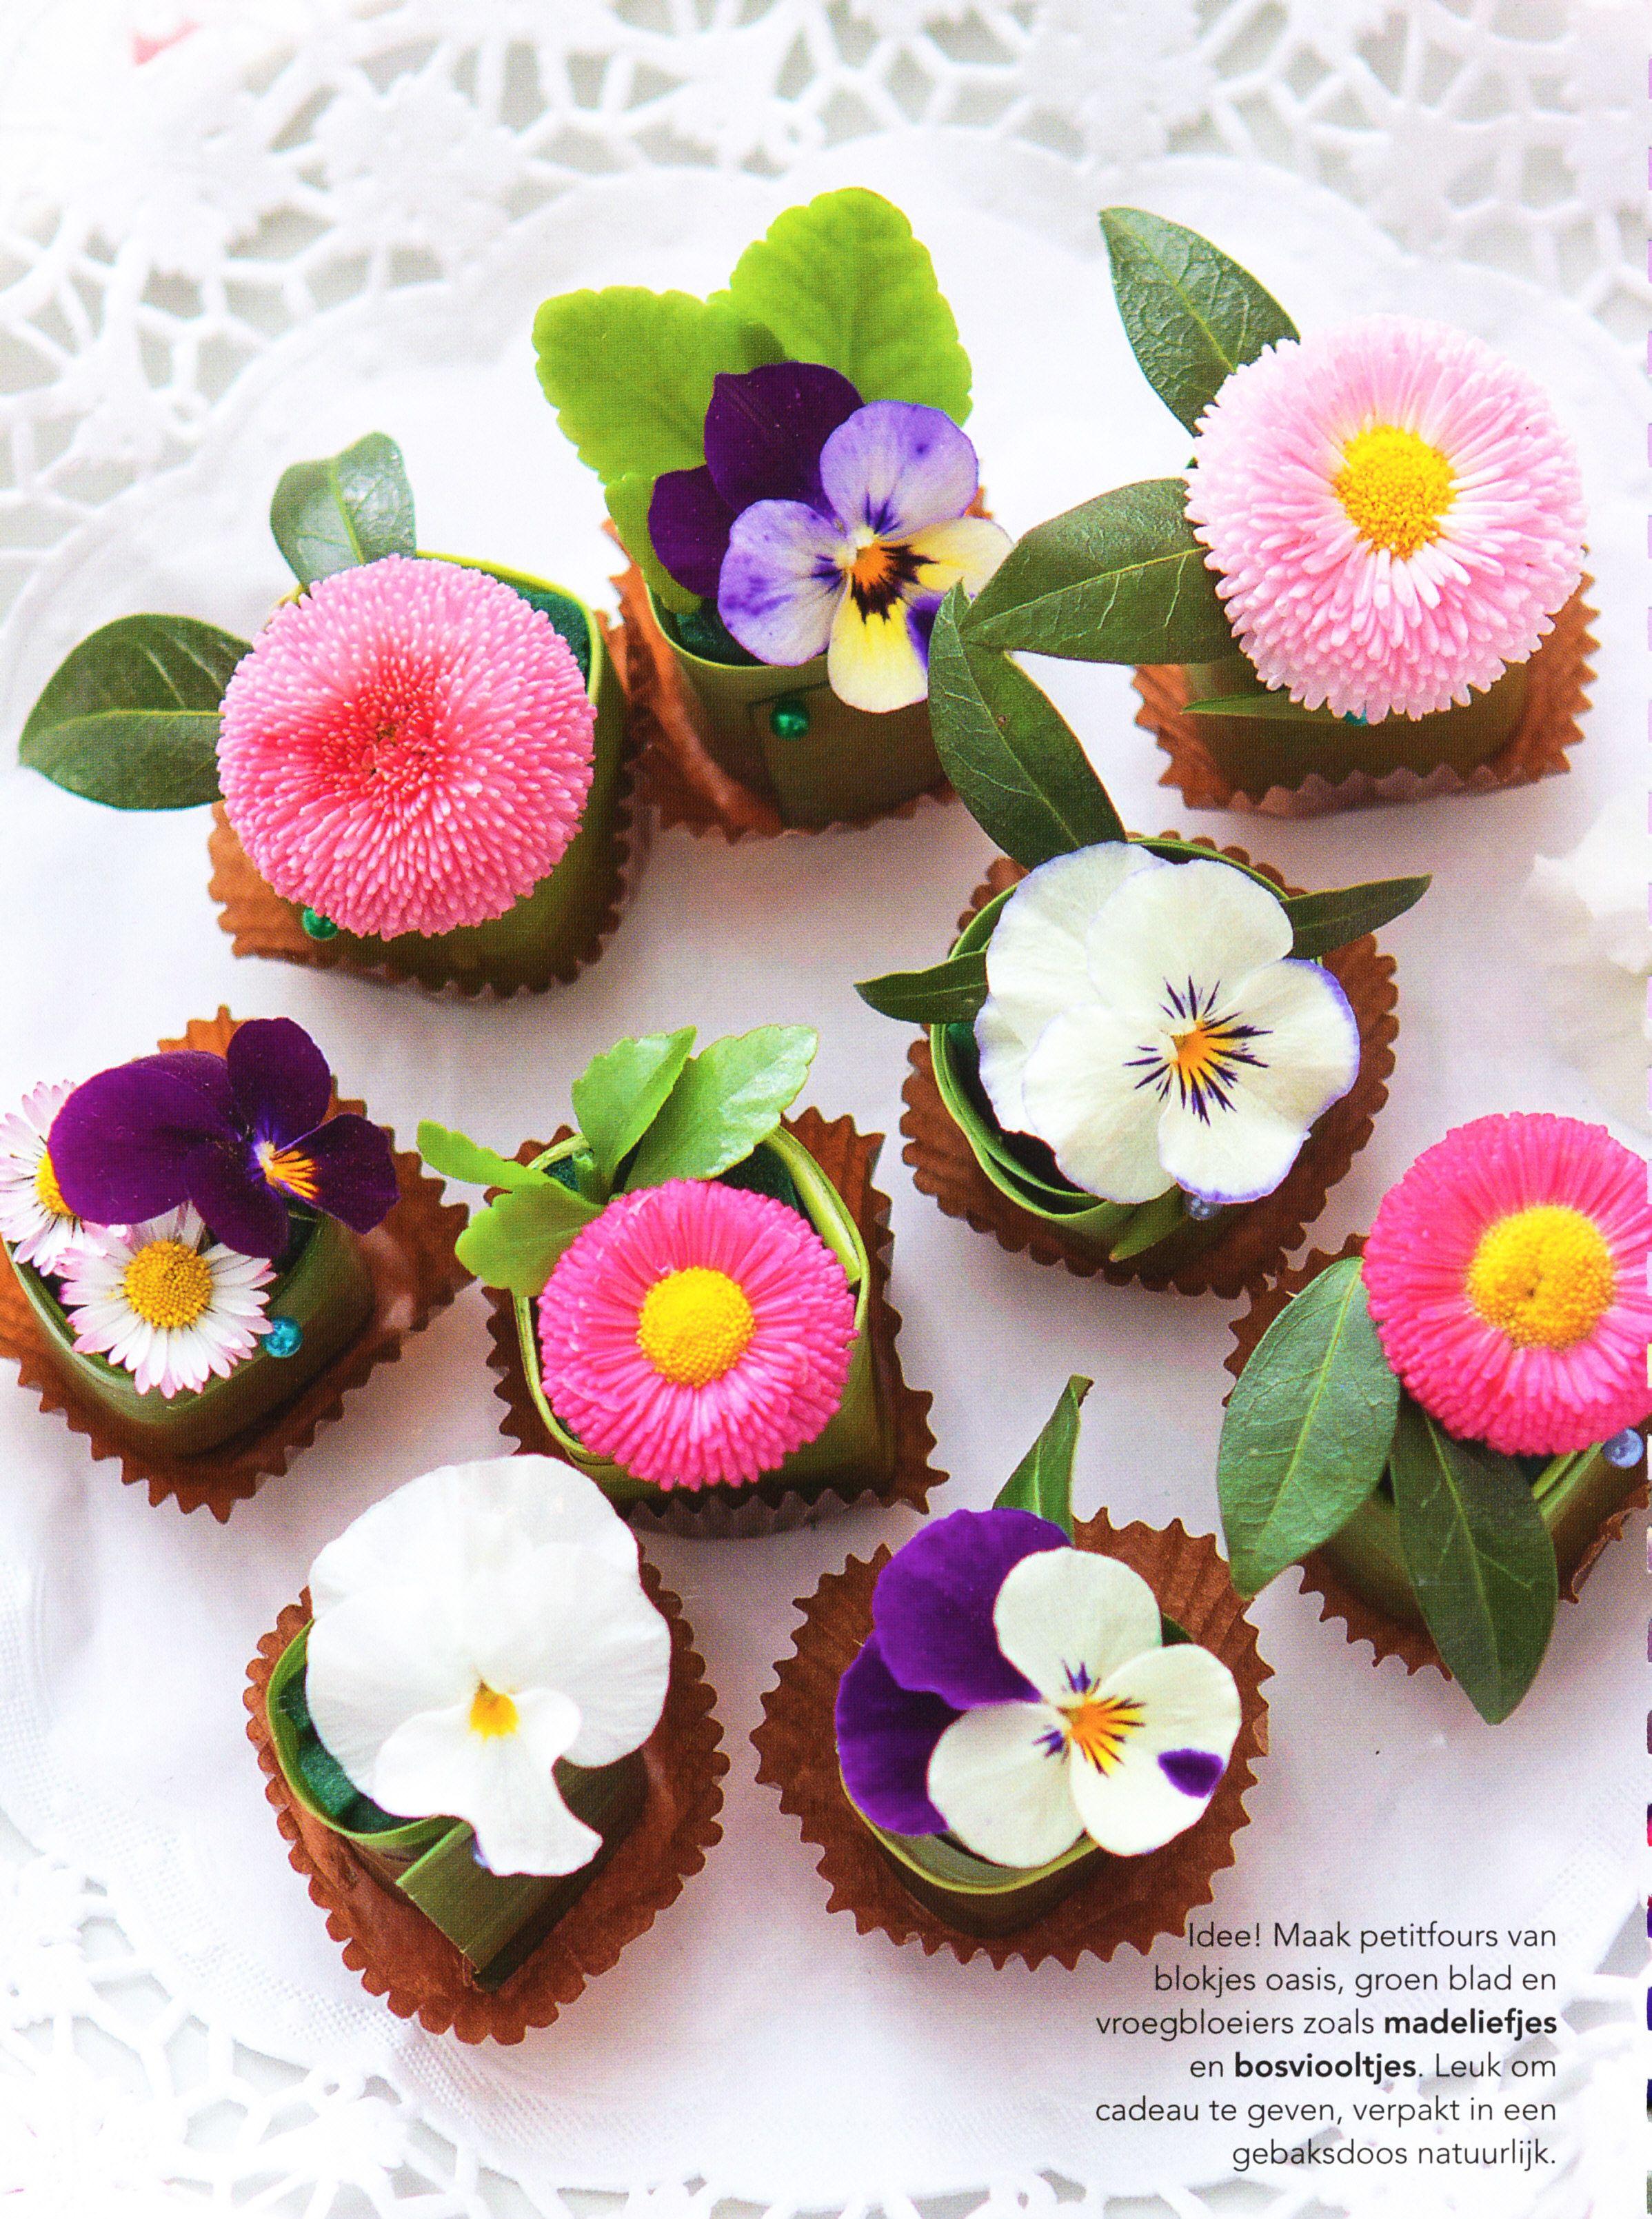 Skin spa monica van roijen monicavanroijen good 4 the soul explore felt cupcakes flower cupcakes and more izmirmasajfo